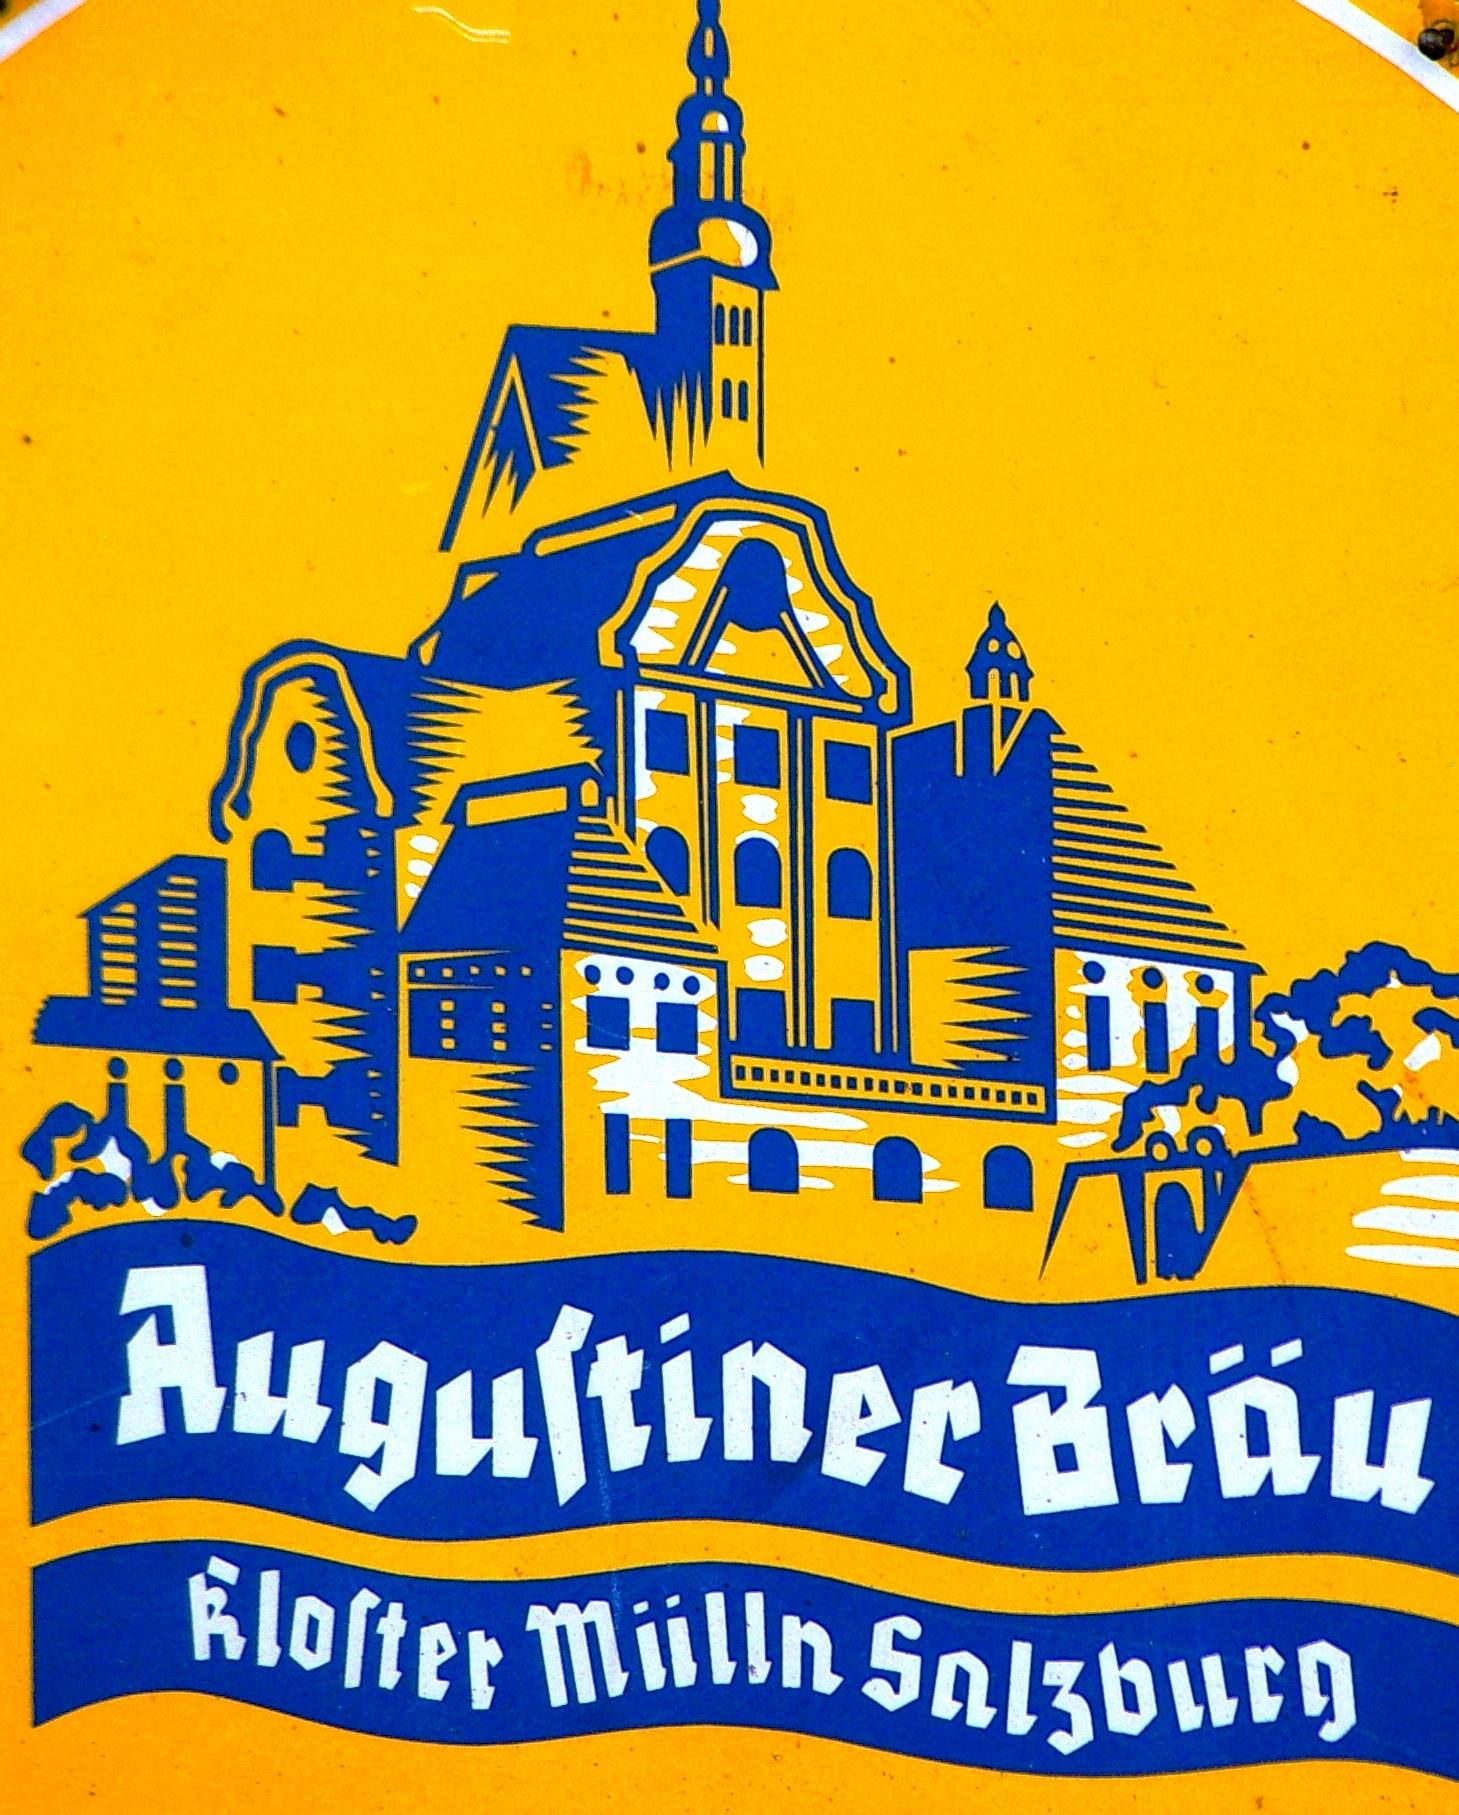 File:Augustiner Bru00e4u Salzburg.JPG - Wikimedia Commons